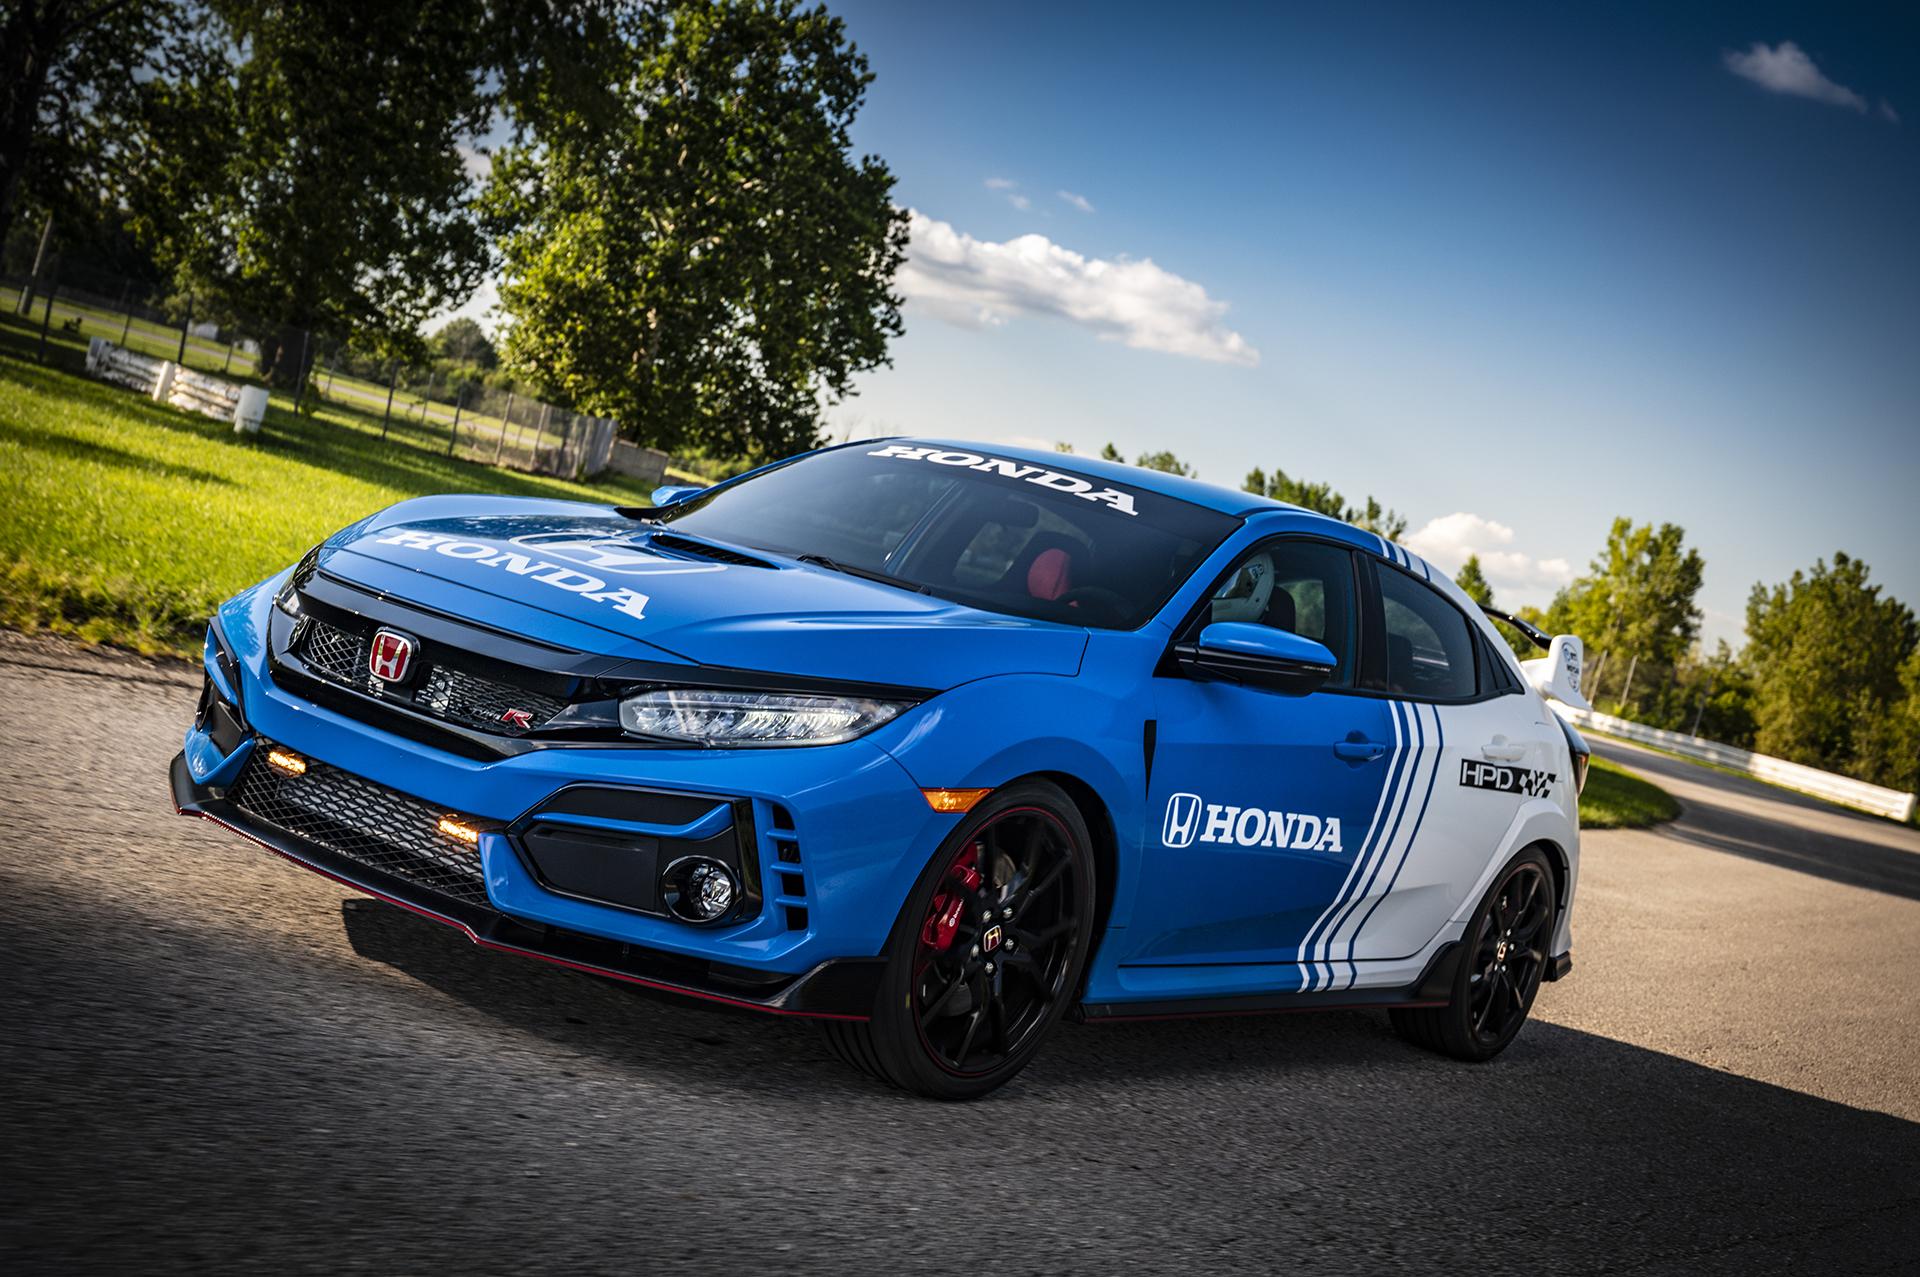 Honda Reveals 2020 Civic Type R Pace Car | MotorworldHype